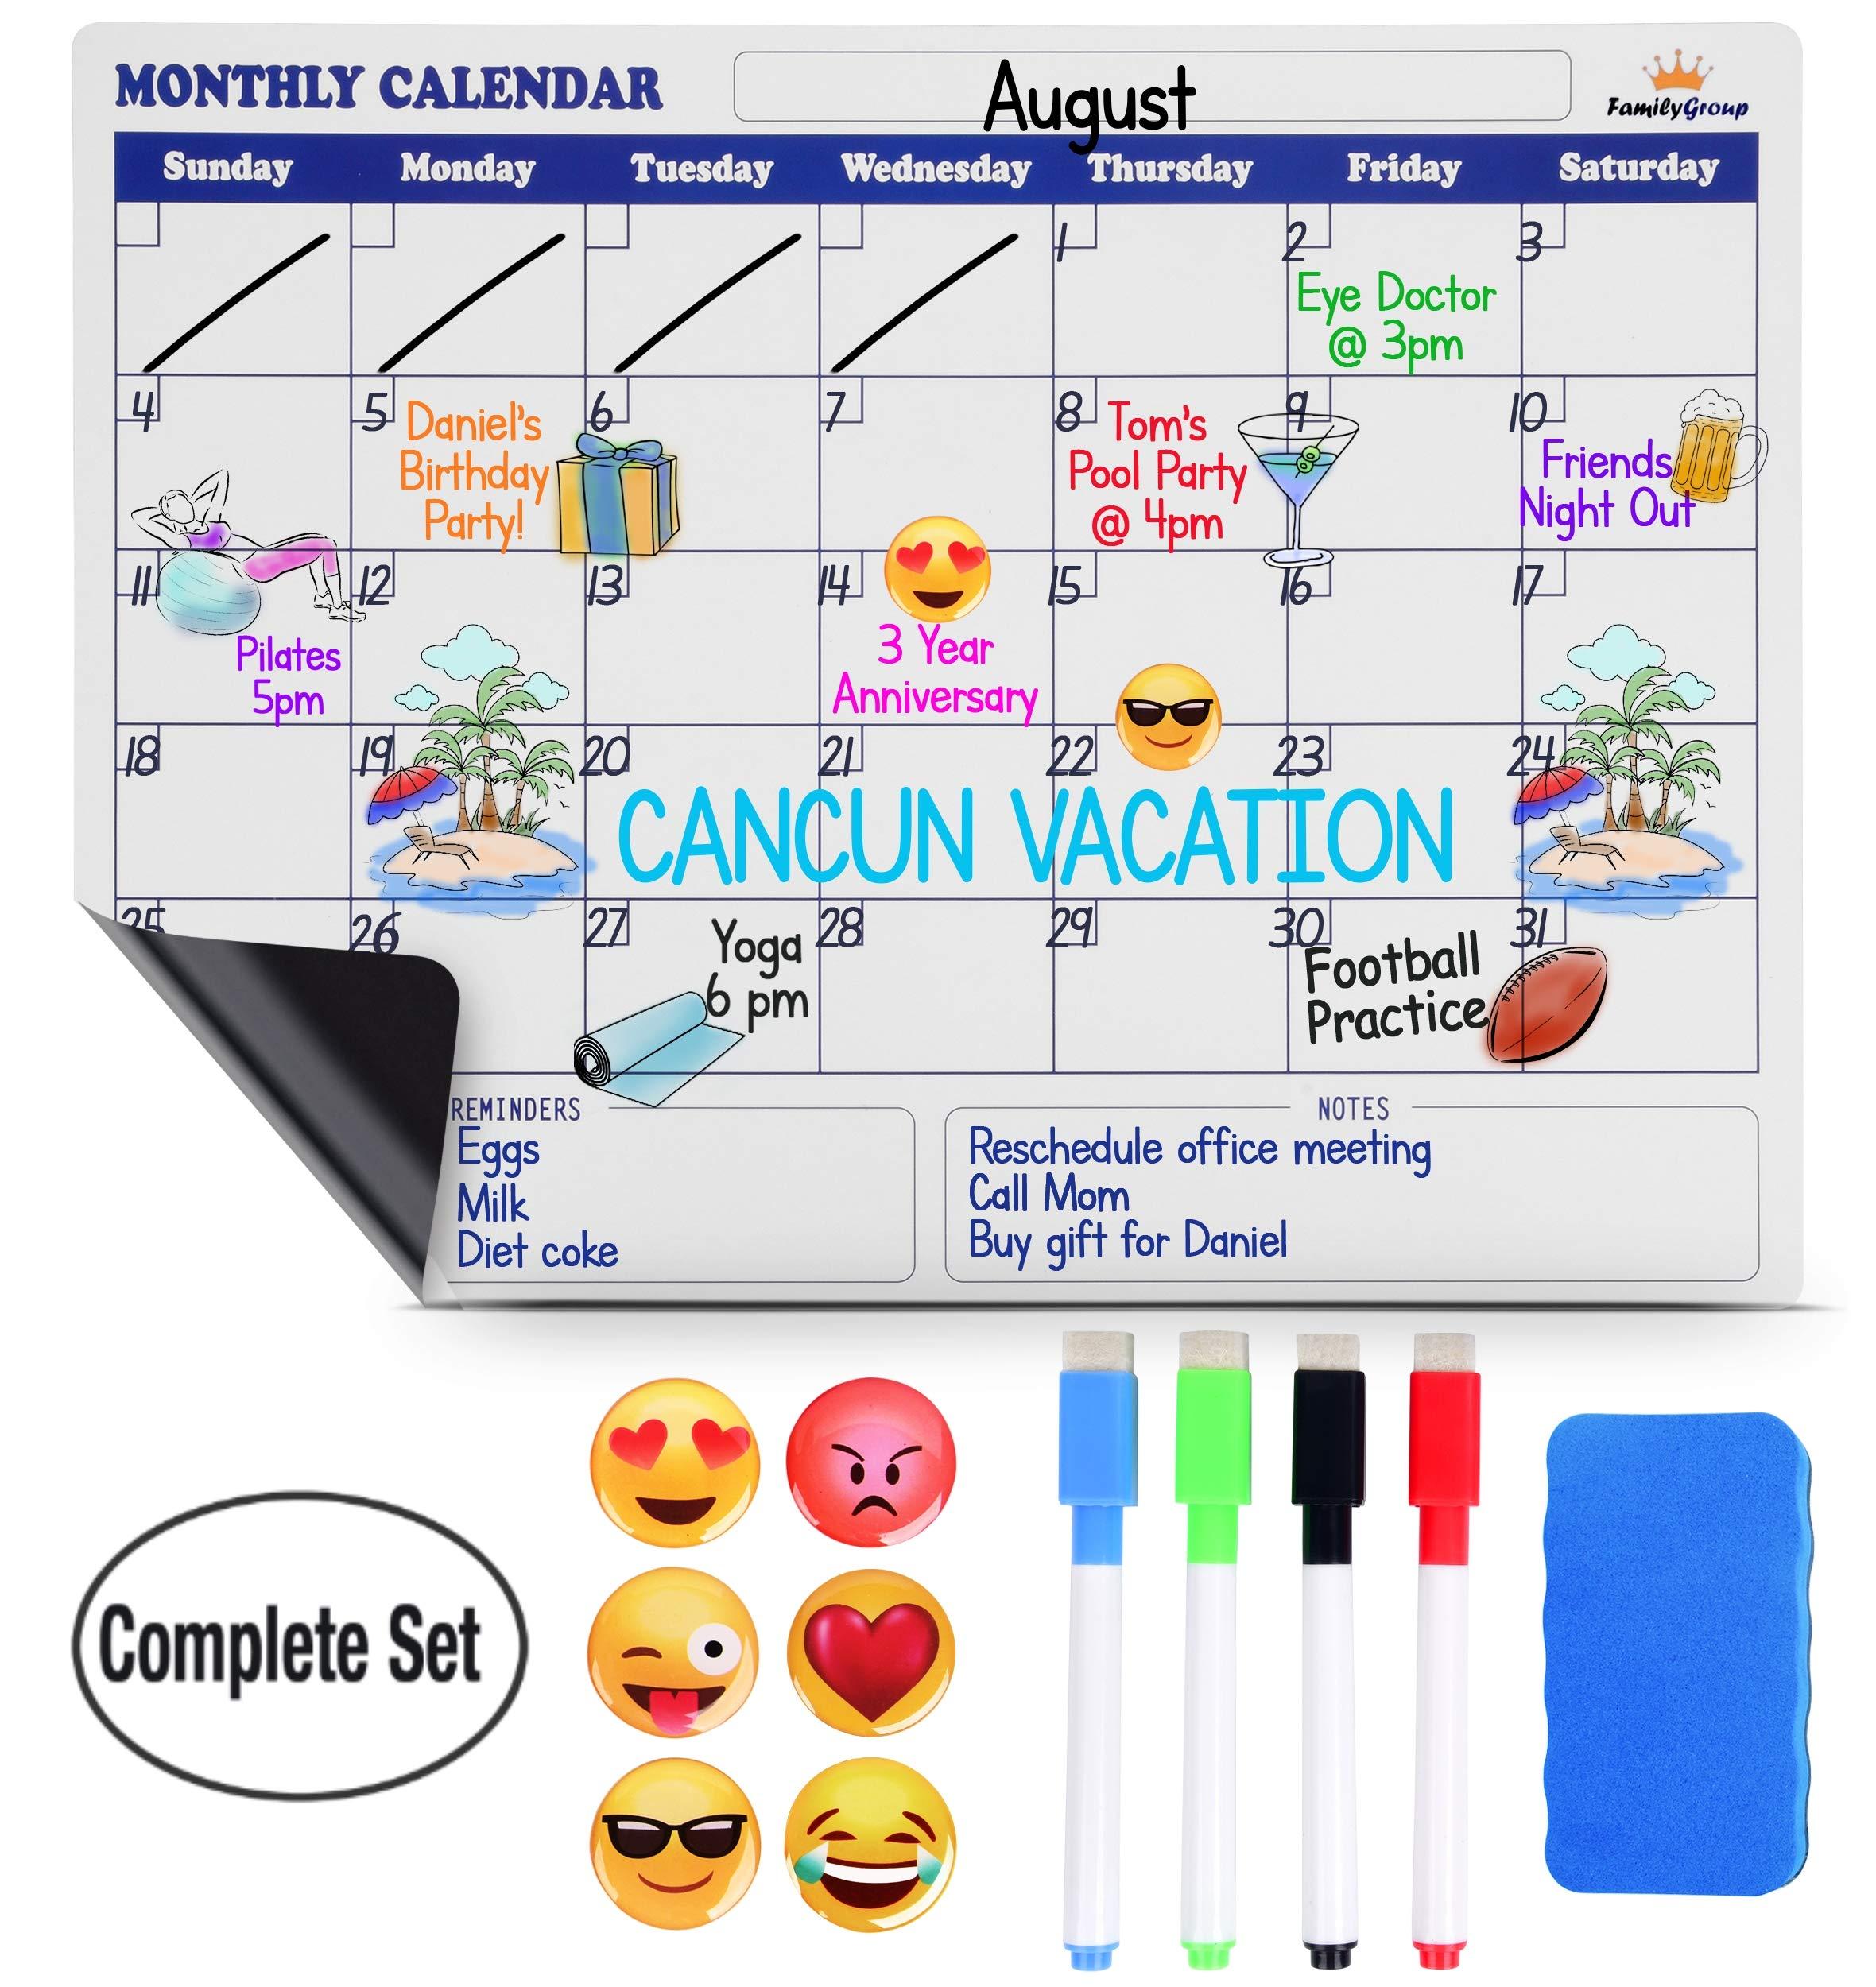 Magnetic Dry Erase Calendar for Fridge - Large Monthly Refrigerator Calendar Whiteboard. Bonus 6 Emoji Magnets, 4 Color Markers,Eraser. Kids Organizer List for Kitchen Refrigerator 16x12 inches White by FamilyGroup